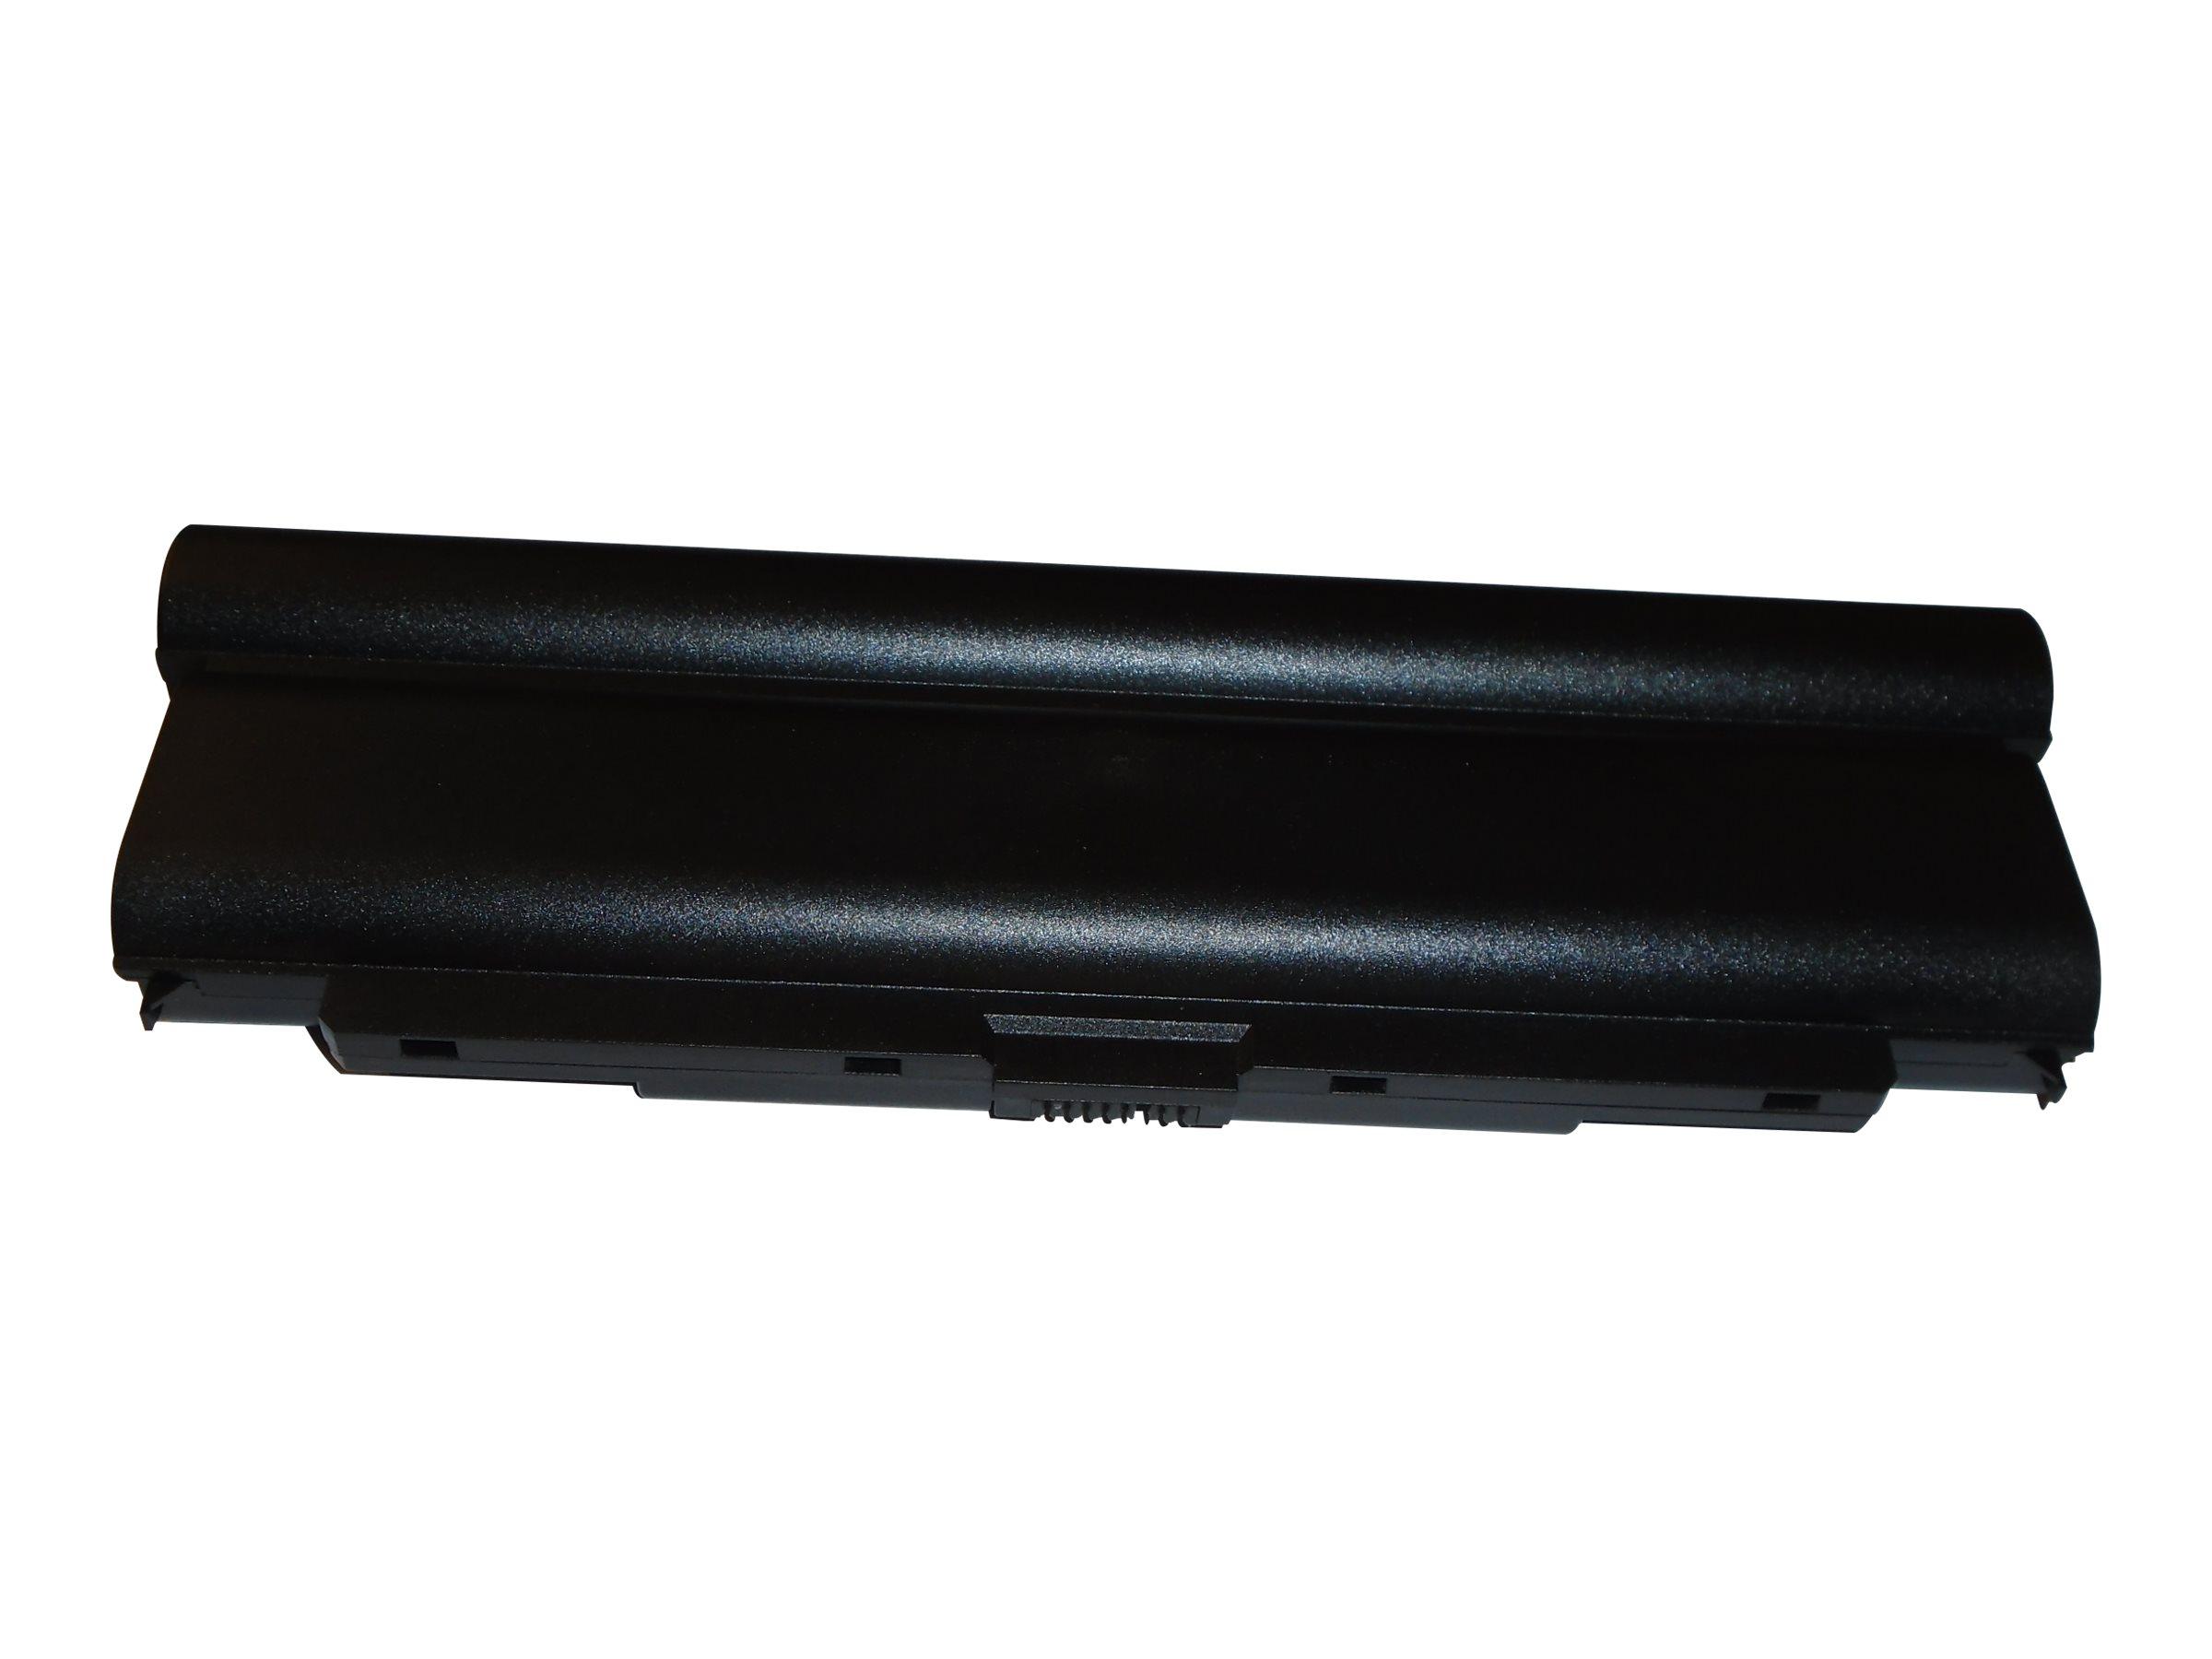 V7 - Laptop-Batterie (gleichwertig mit: Lenovo 0C52864, Lenovo 45N1150, Lenovo 45N1151) - für Lenovo ThinkPad L440; L540; T440p;